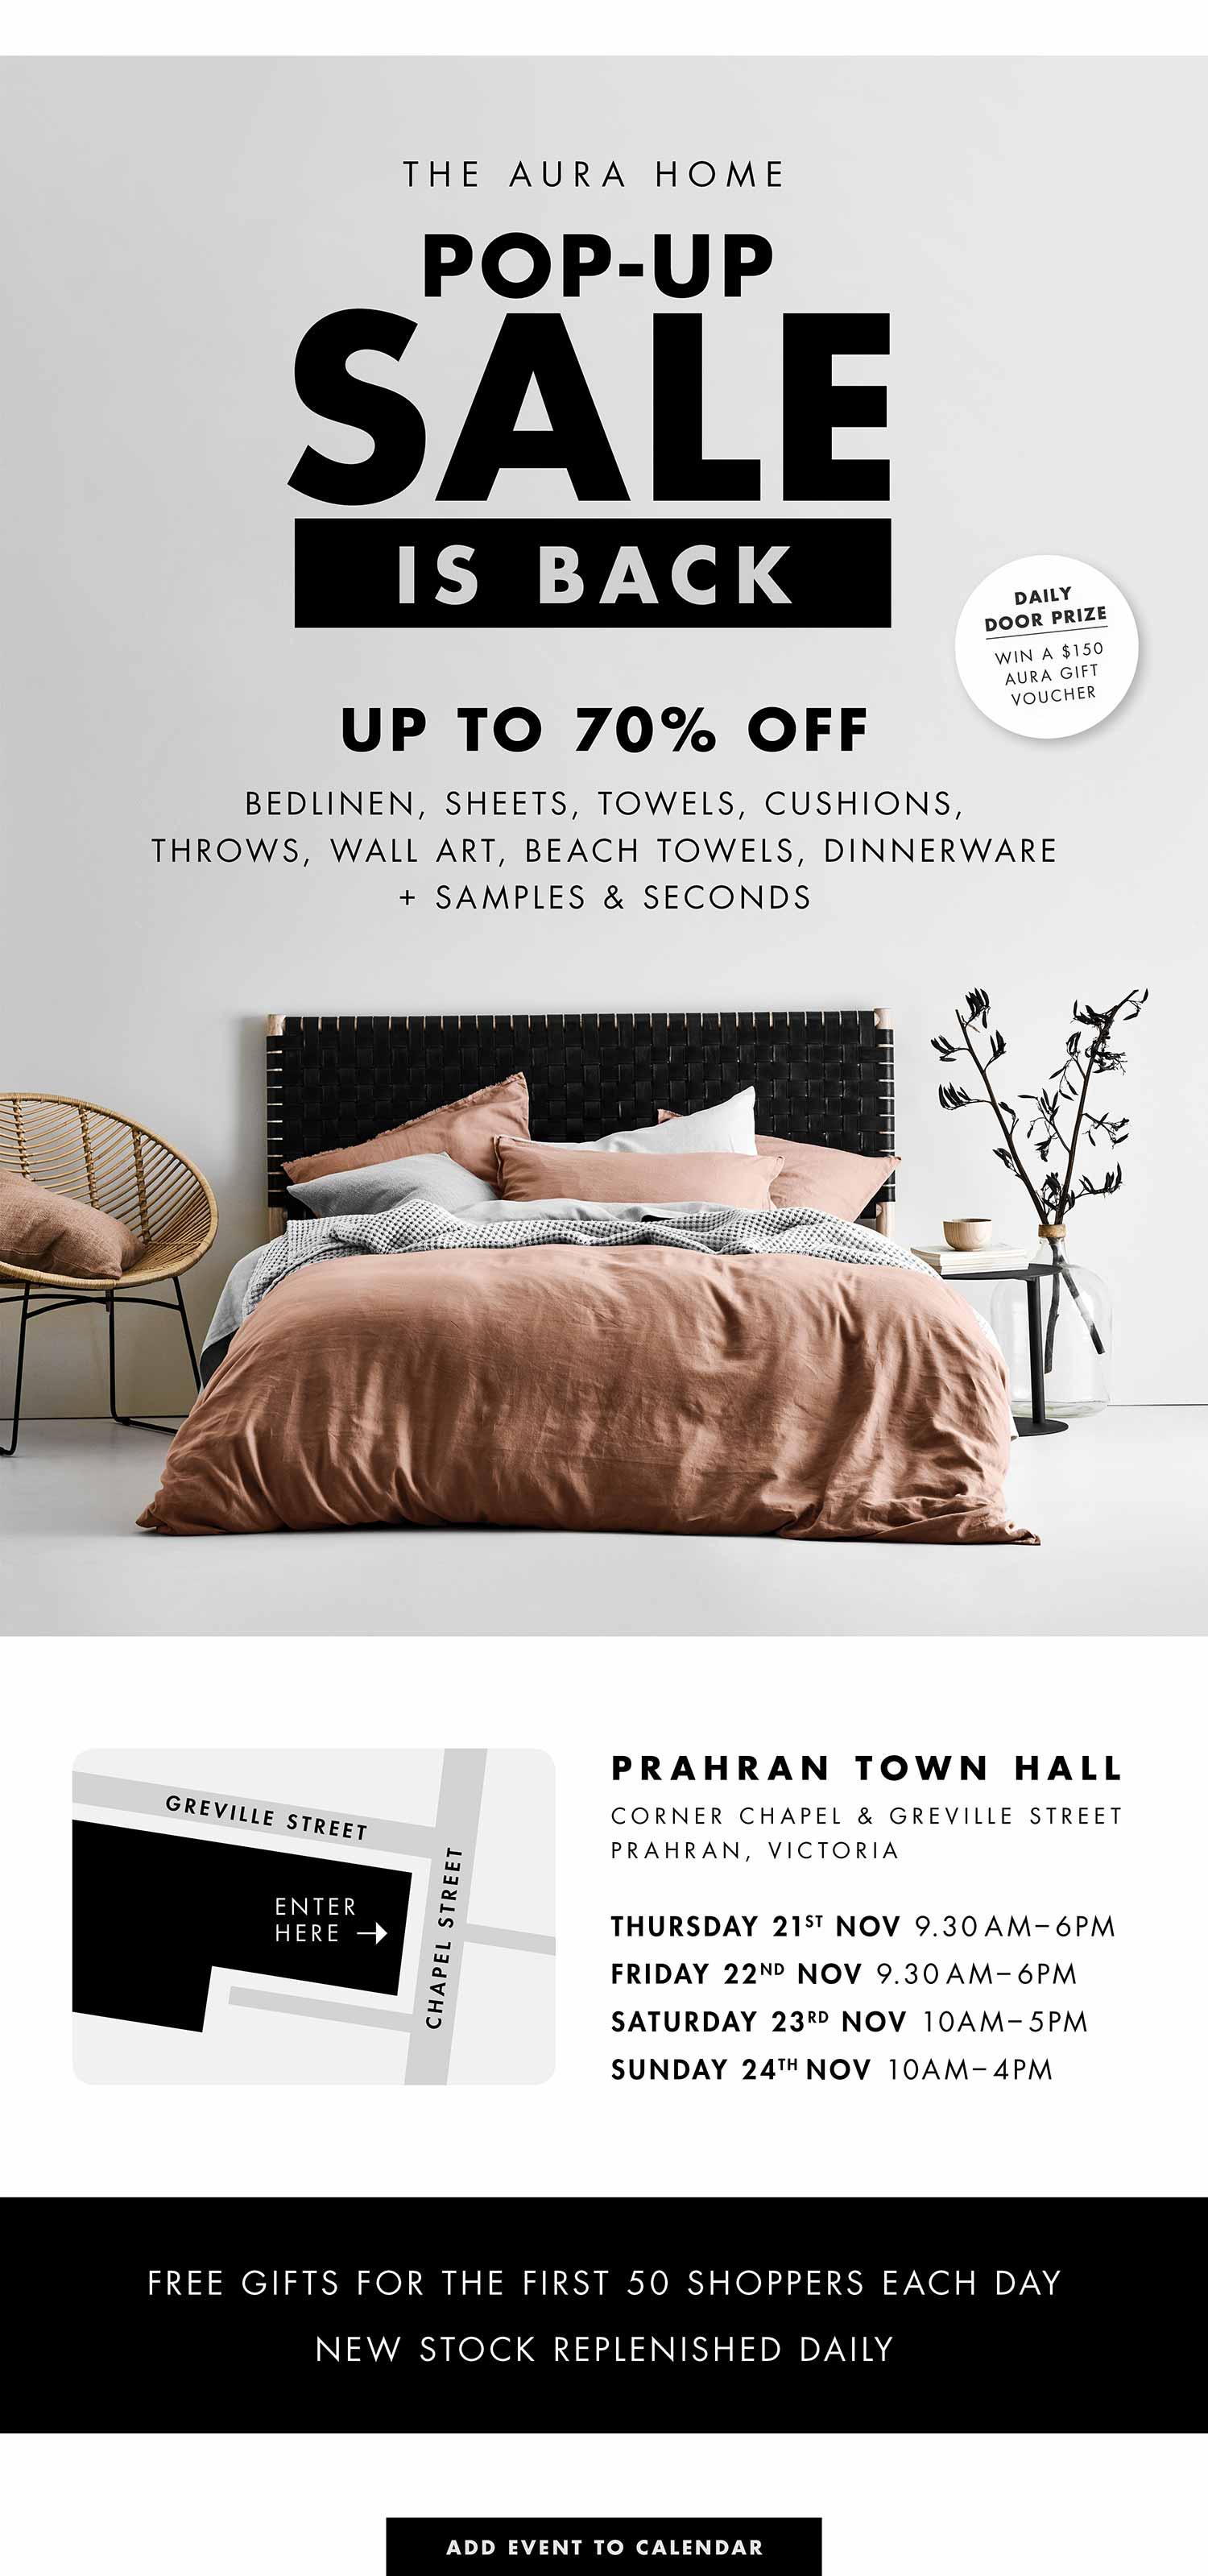 Aura Home Pop-Up Sale Prahran Town Hall May 24 – 26